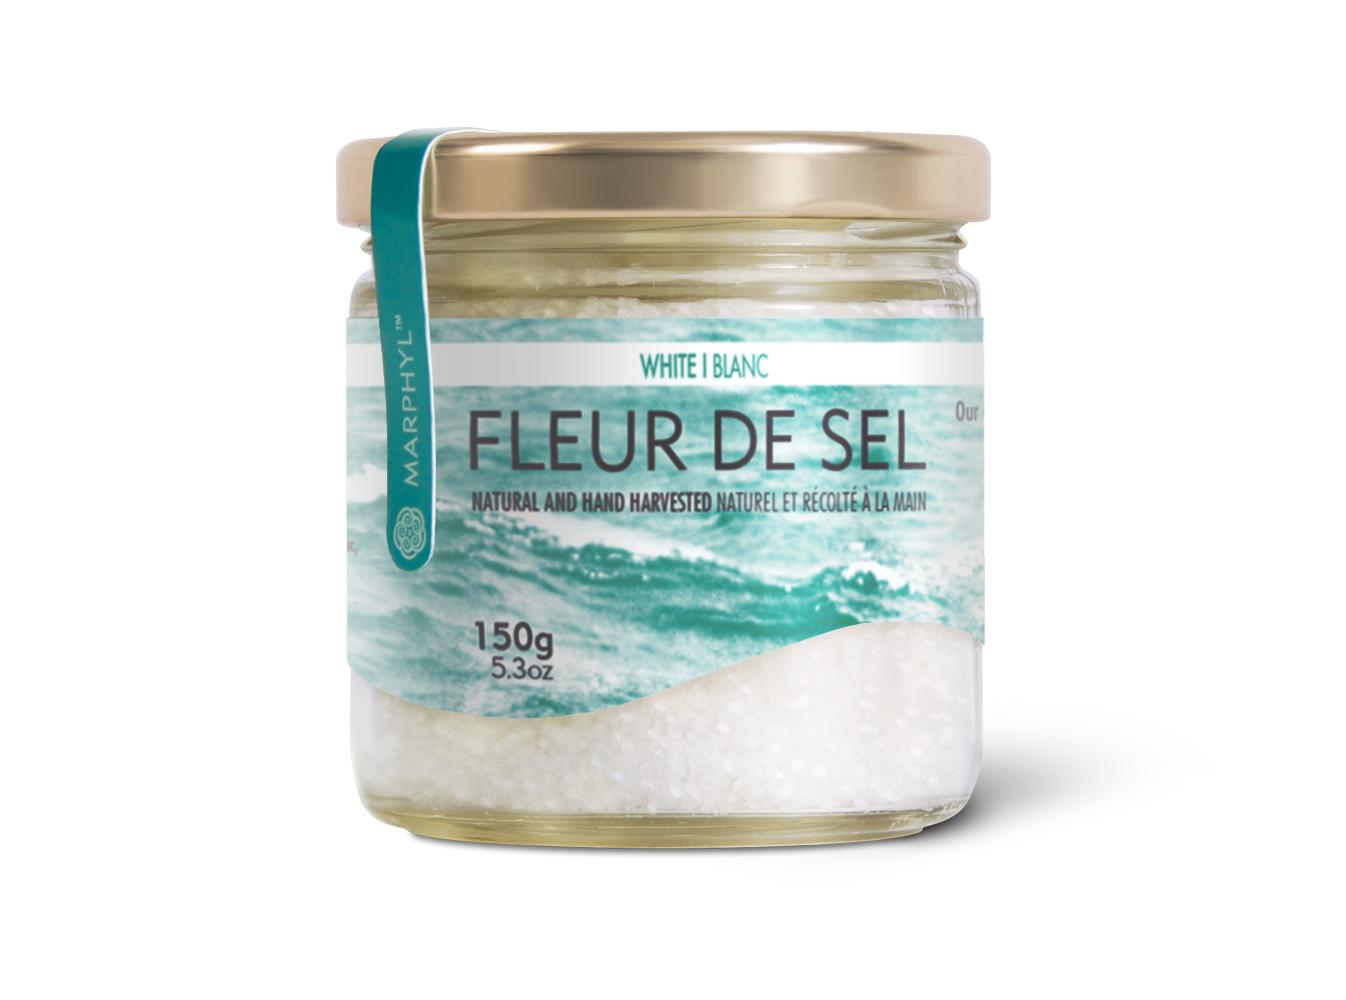 Marphyl Marine Phytoplankton Natural Sea Salt 150g 5.3oz White